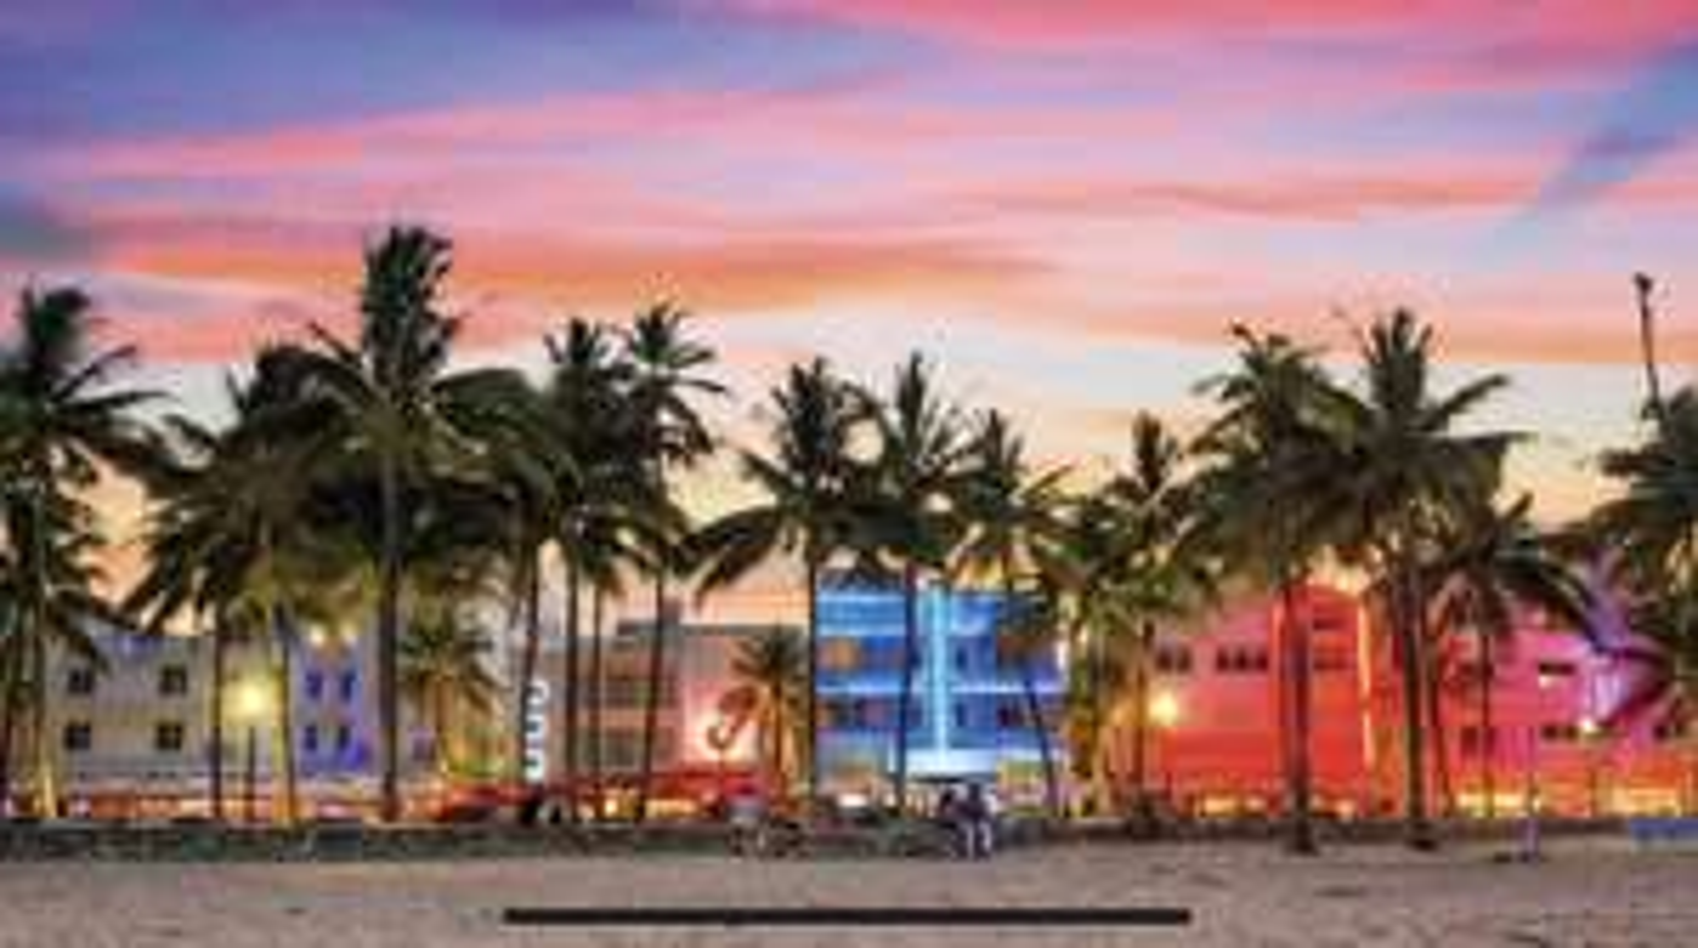 8 Tage Miami Urlaub ab 425€ mit Unterkunft, Frühstück und Flug